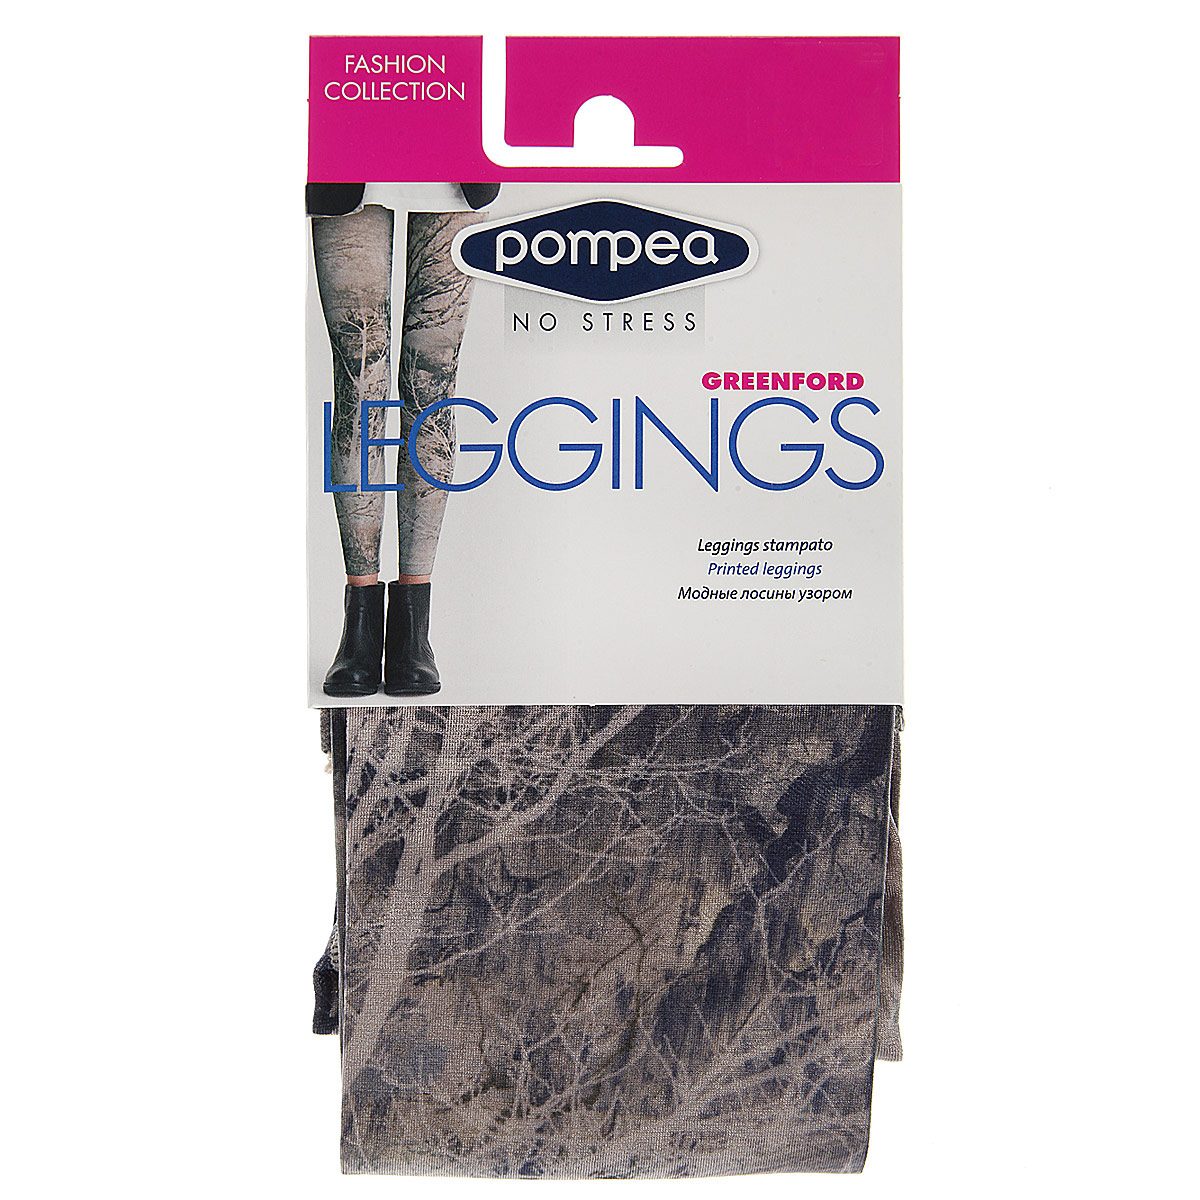 Леггинсы женские Pompea Leggings Greenford Fashion, цвет: Nature (природа). Размер 2 (1/2-S) женские леггинсы brand new 2015 1 dk045 leeging leggings